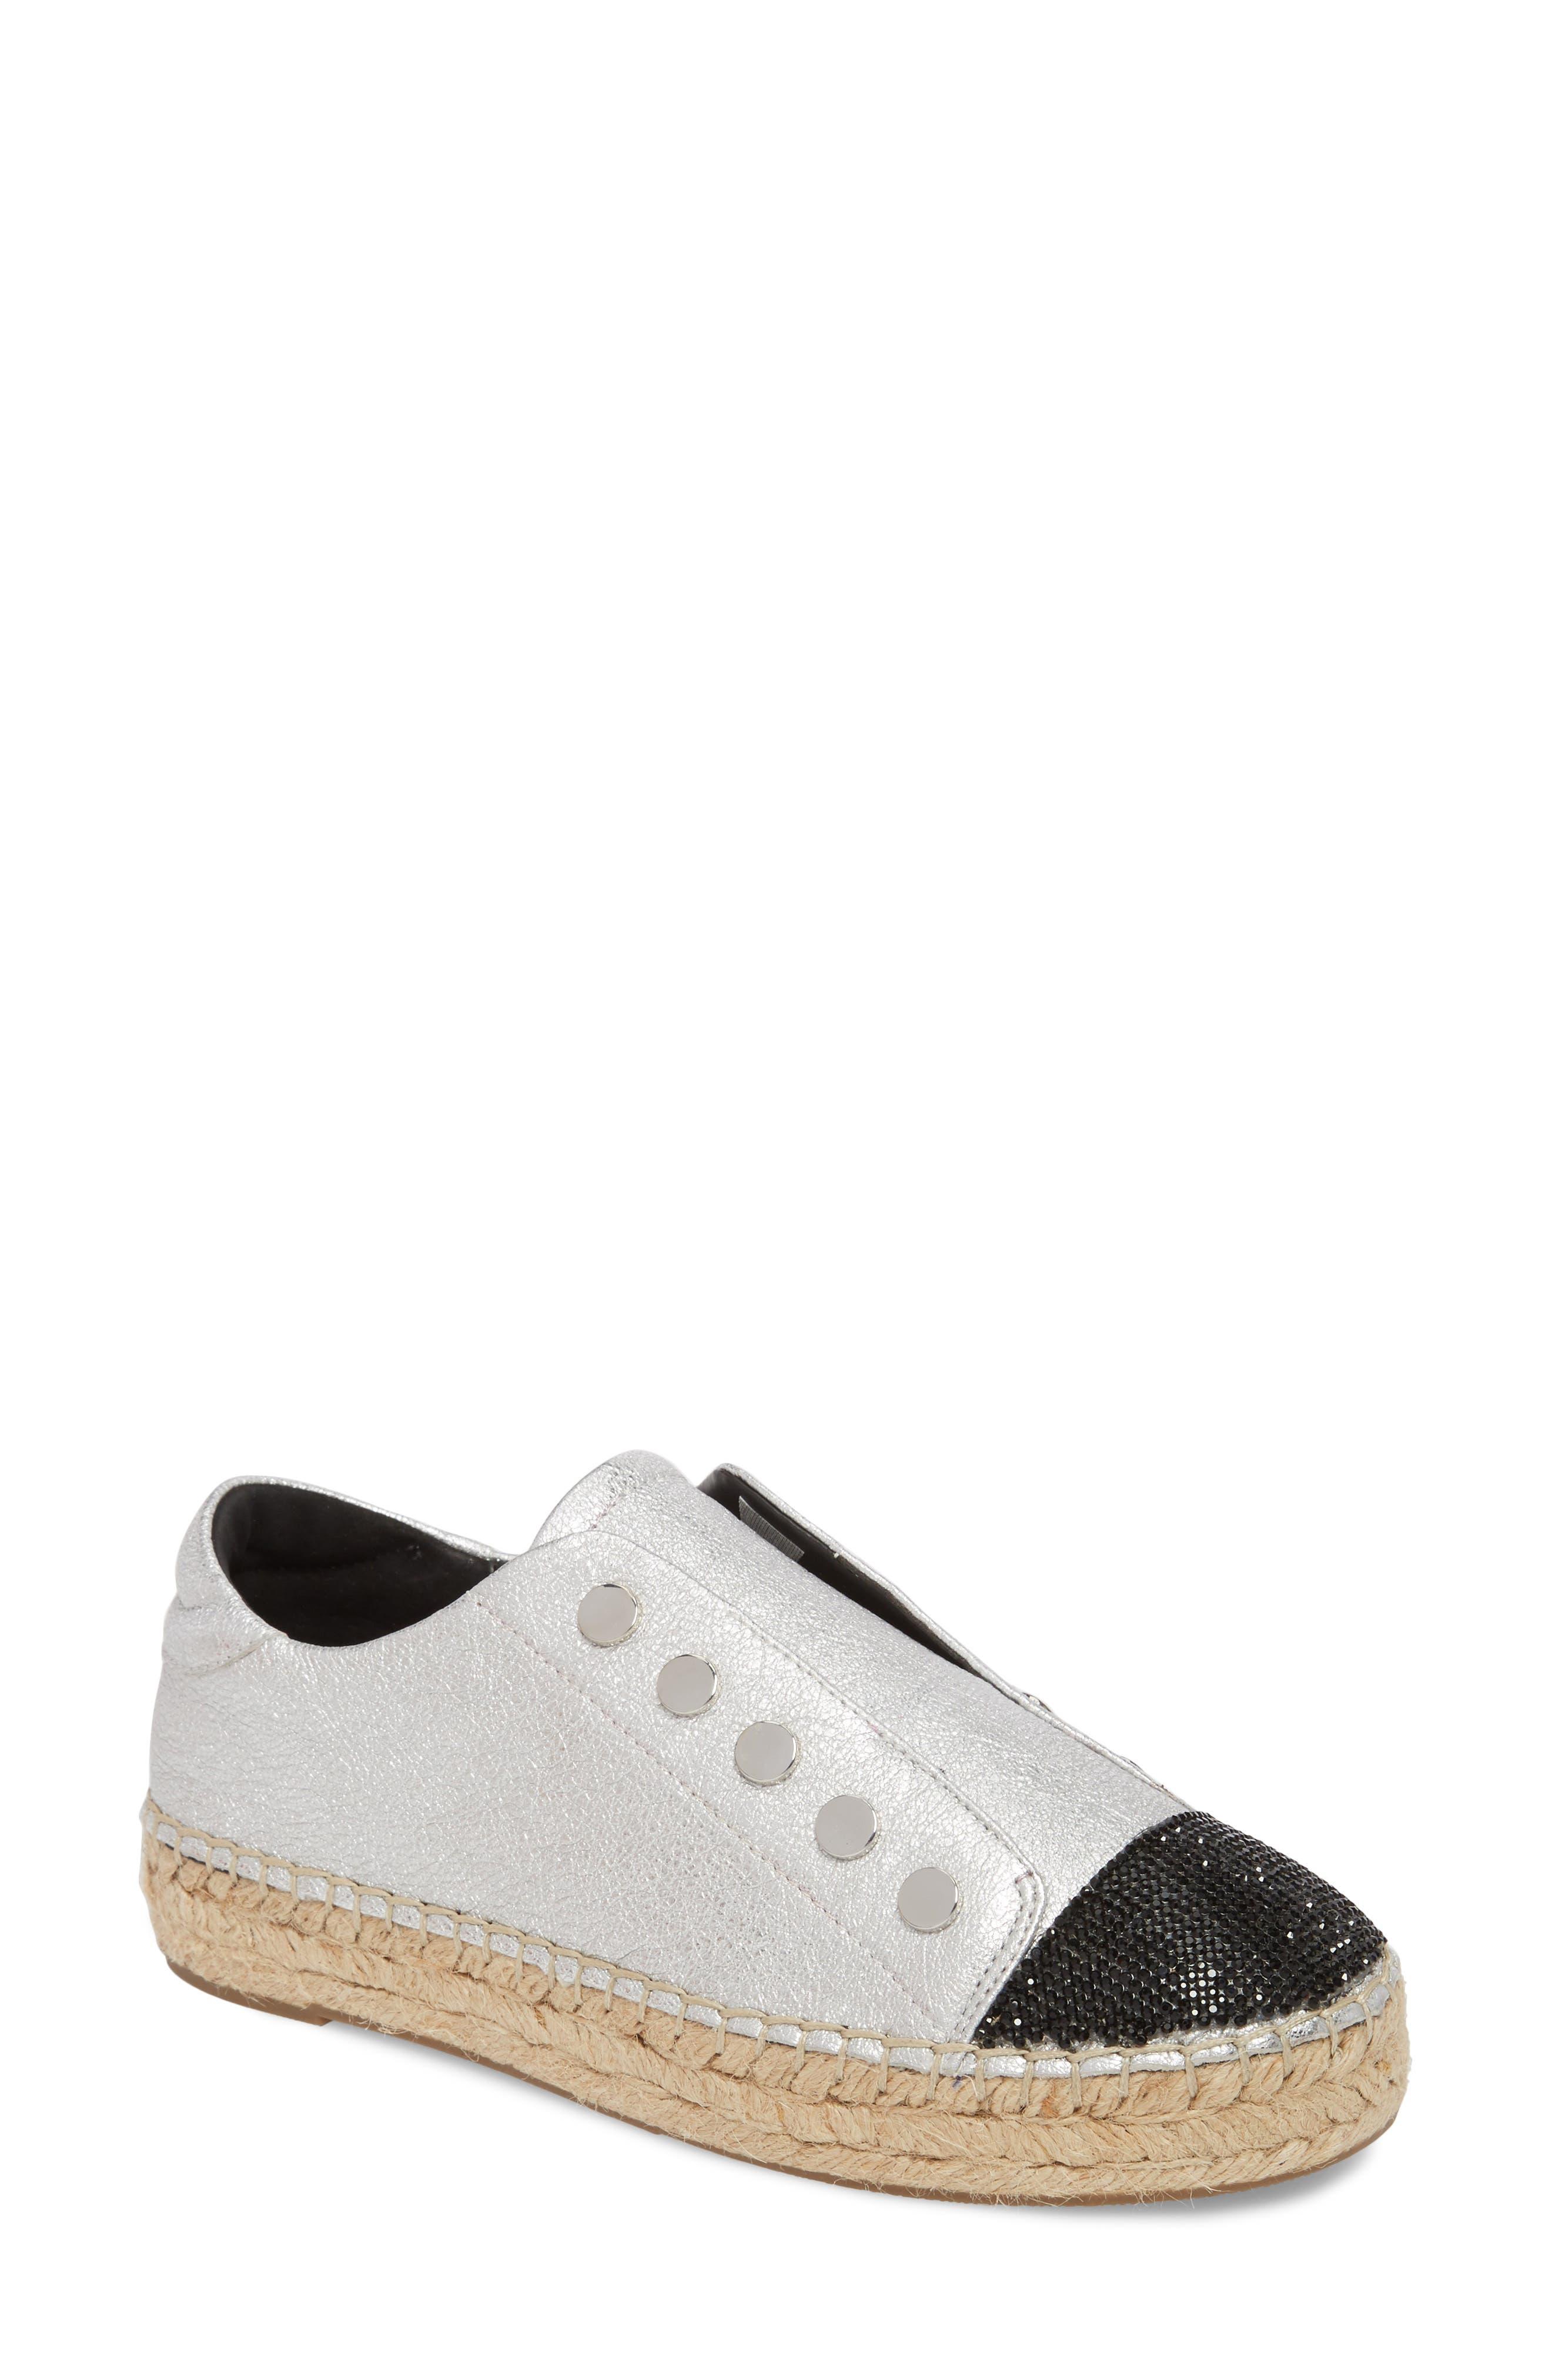 Juniper Espadrille Sneaker,                         Main,                         color, SILVER